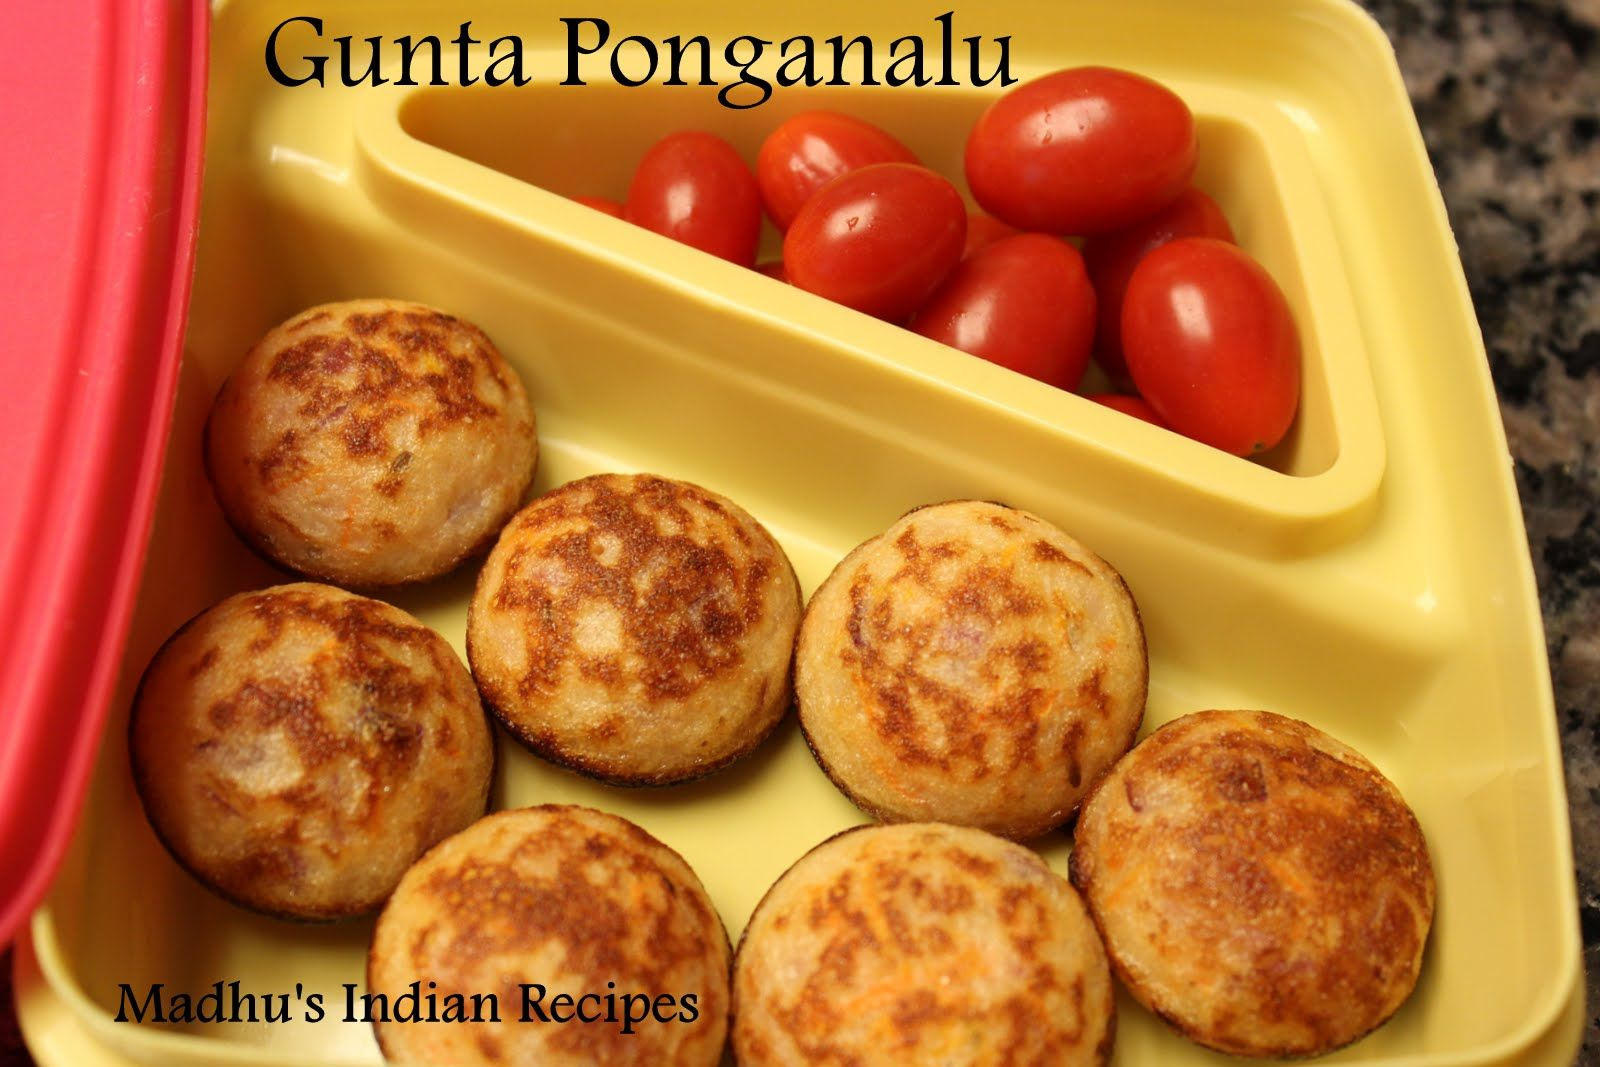 Madhus Everyday Indian Lunch Box Idea Kid Friendly Recipe Gunta Ponganalu